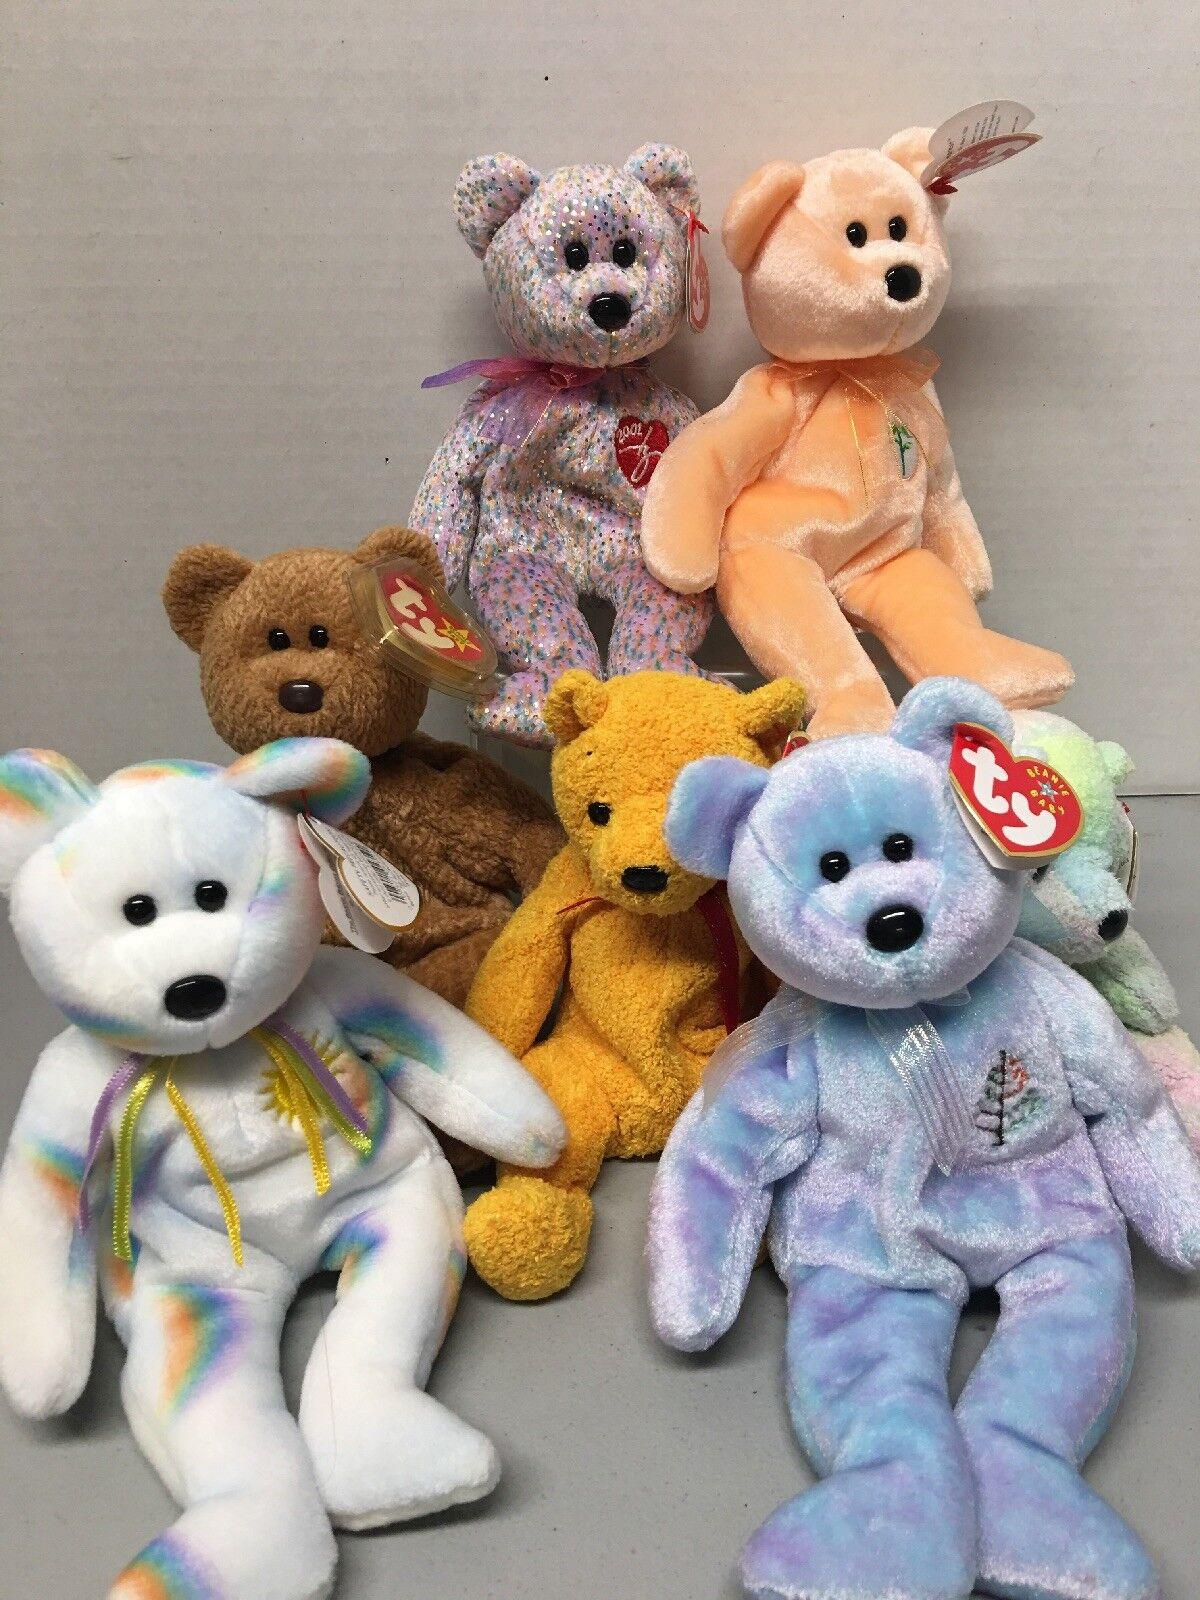 TY Beanie Babies  2001 SIGNATURE BEARcurly  Poopsie. Cheery. Dearest. Bear Set.